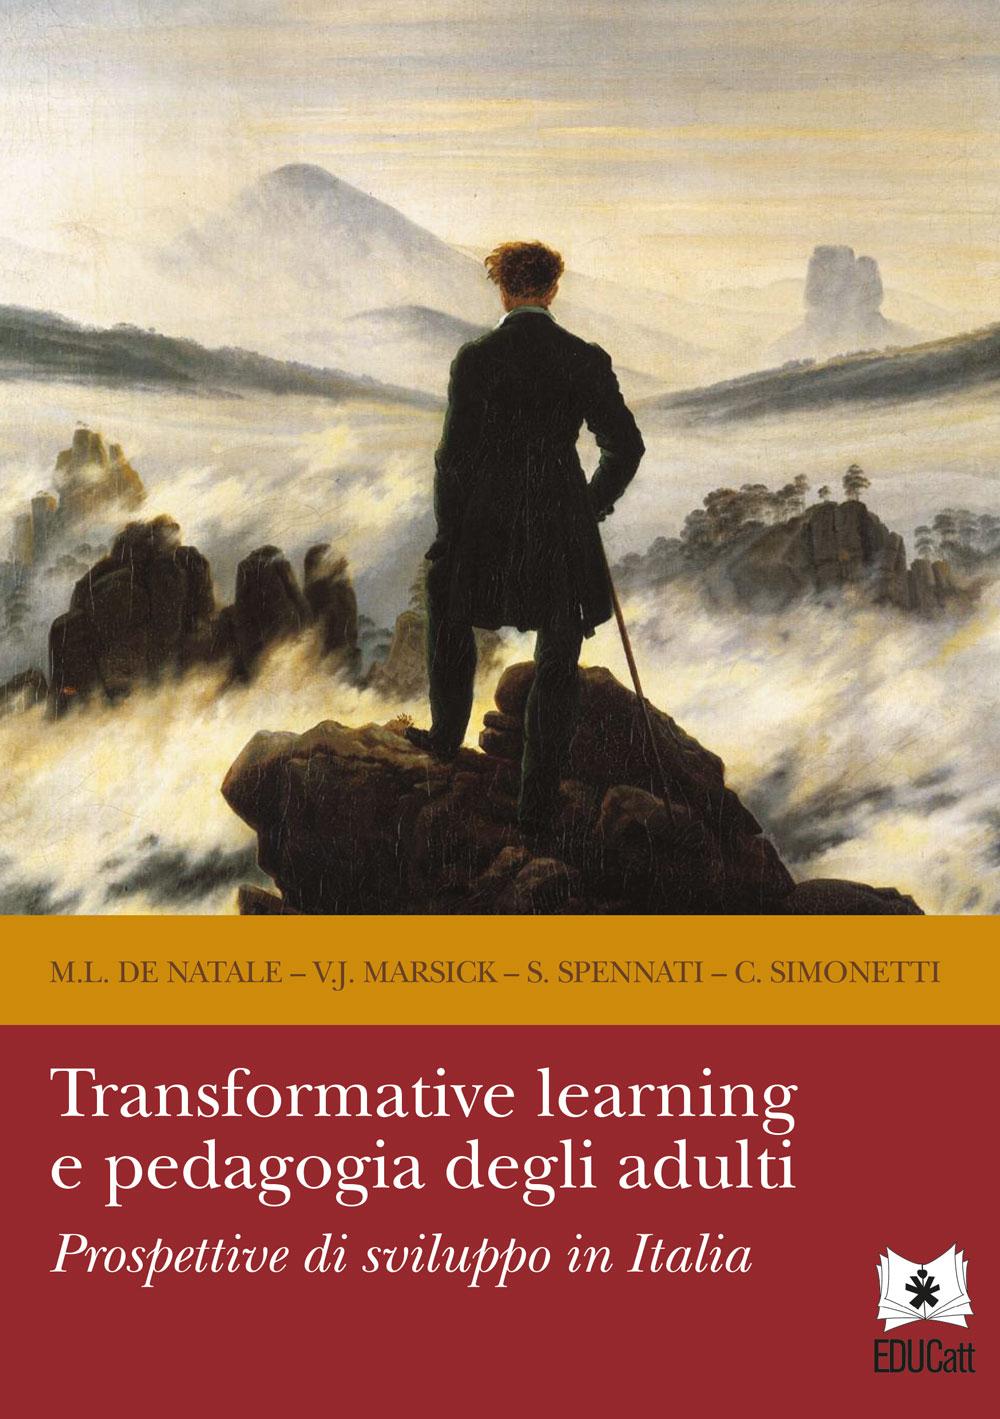 TRANSFORMATIVE LEARNING E PEDAGOGIA DEGLI ADULTI